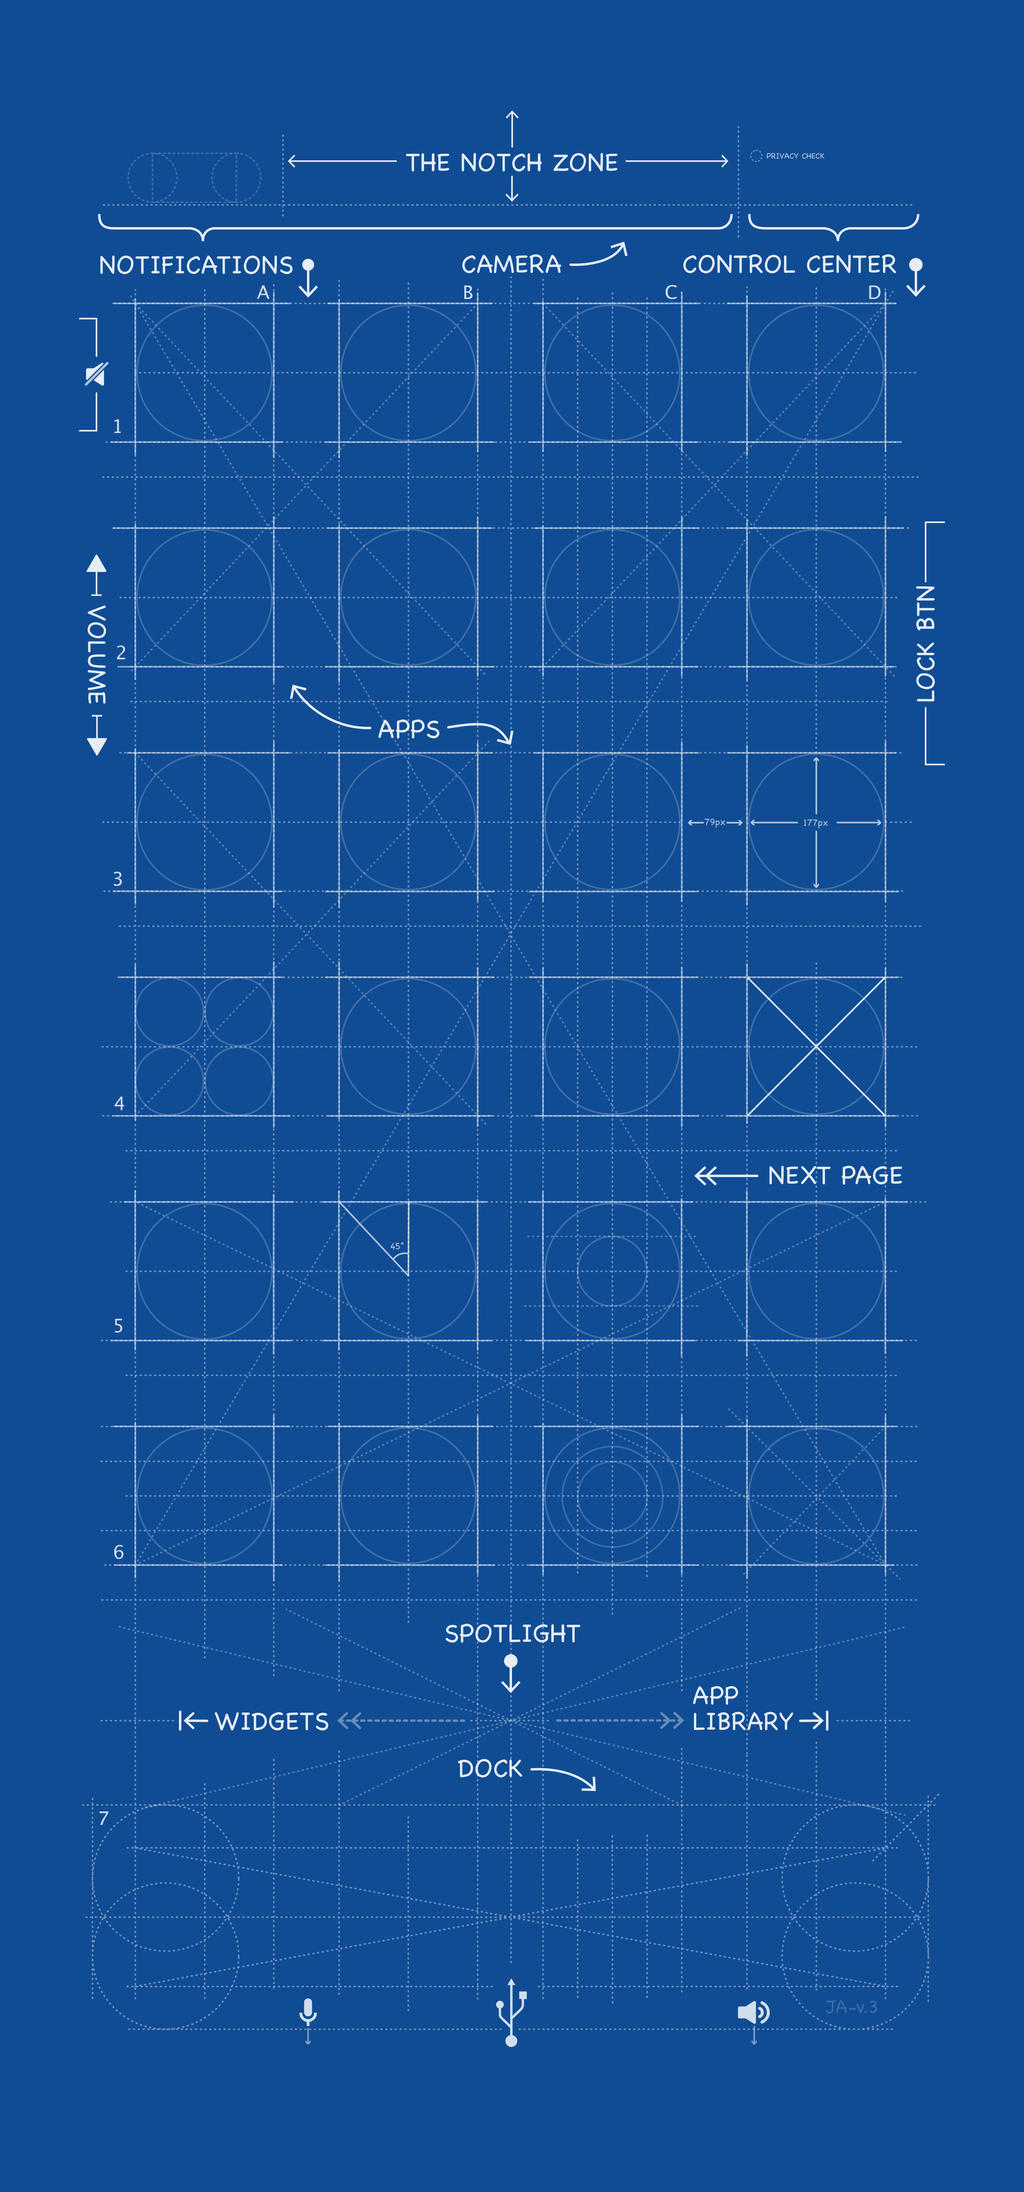 Iphone 11 Pro Max Ios14 Blueprint Wallpaper By Mrdude42 On Deviantart